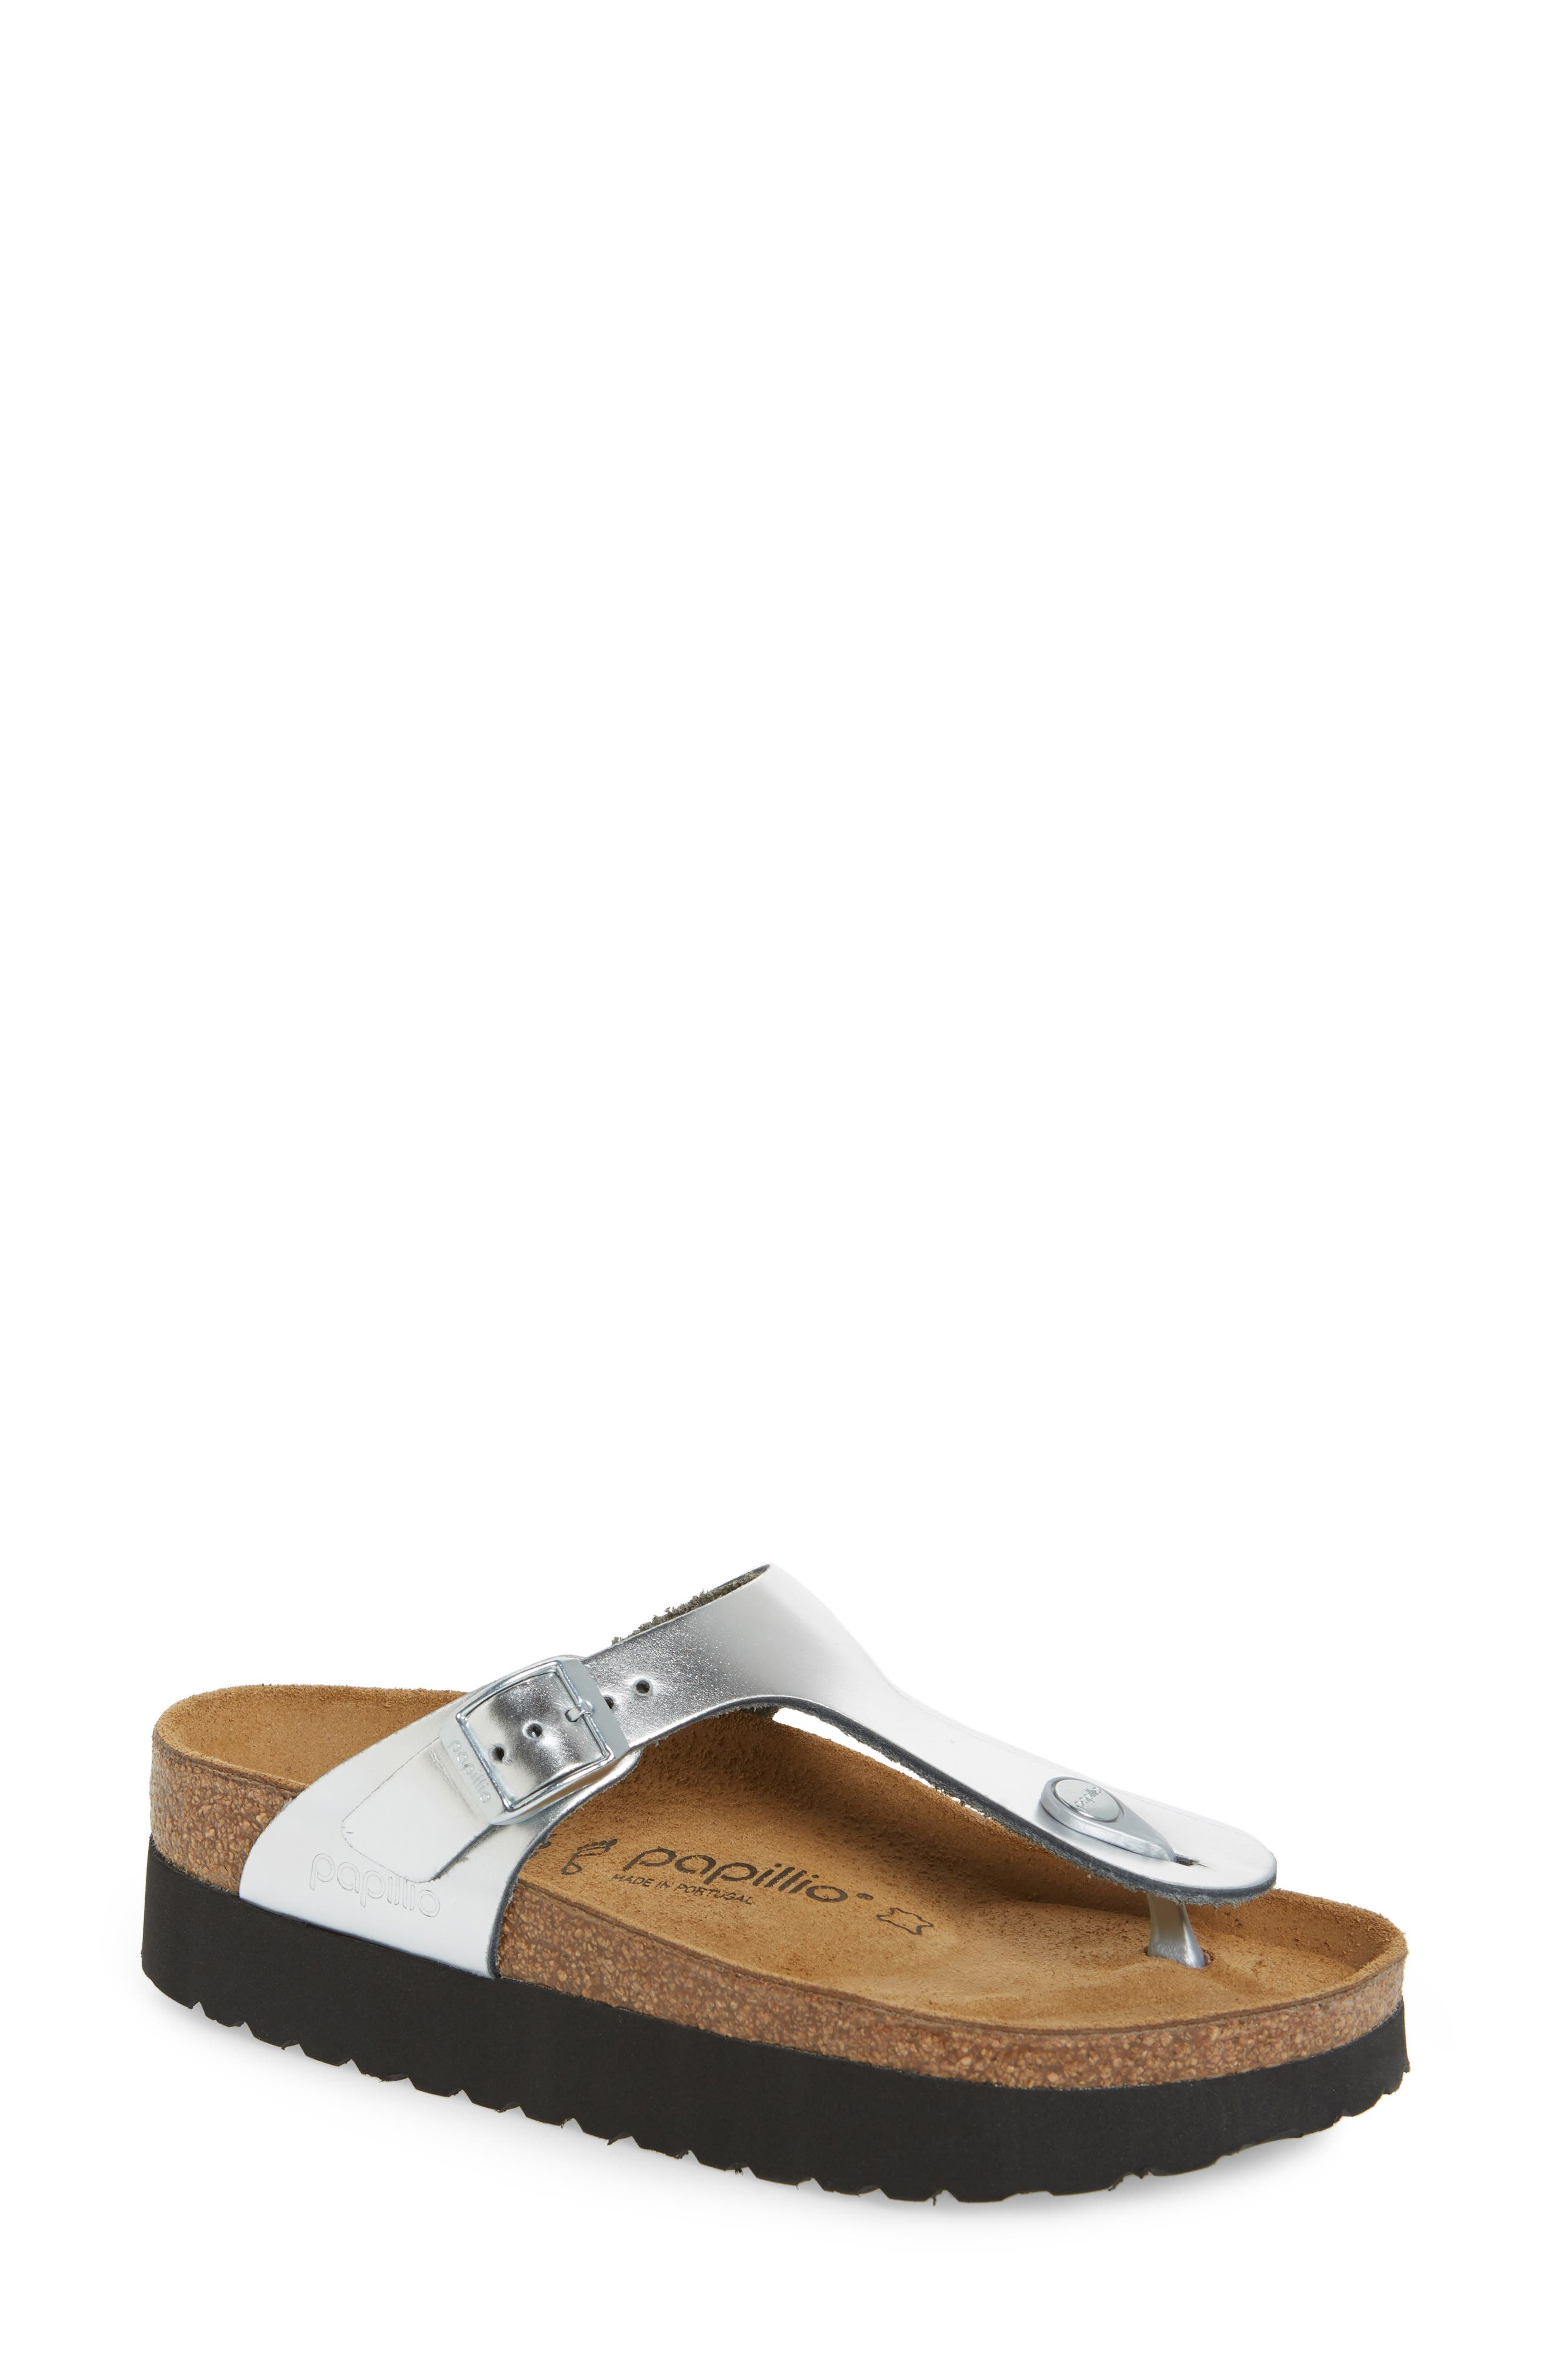 Birkenstock Slippers Papillio by Birkenstock 'Gizeh' Birko-Flor Platform Flip Flop Sandal